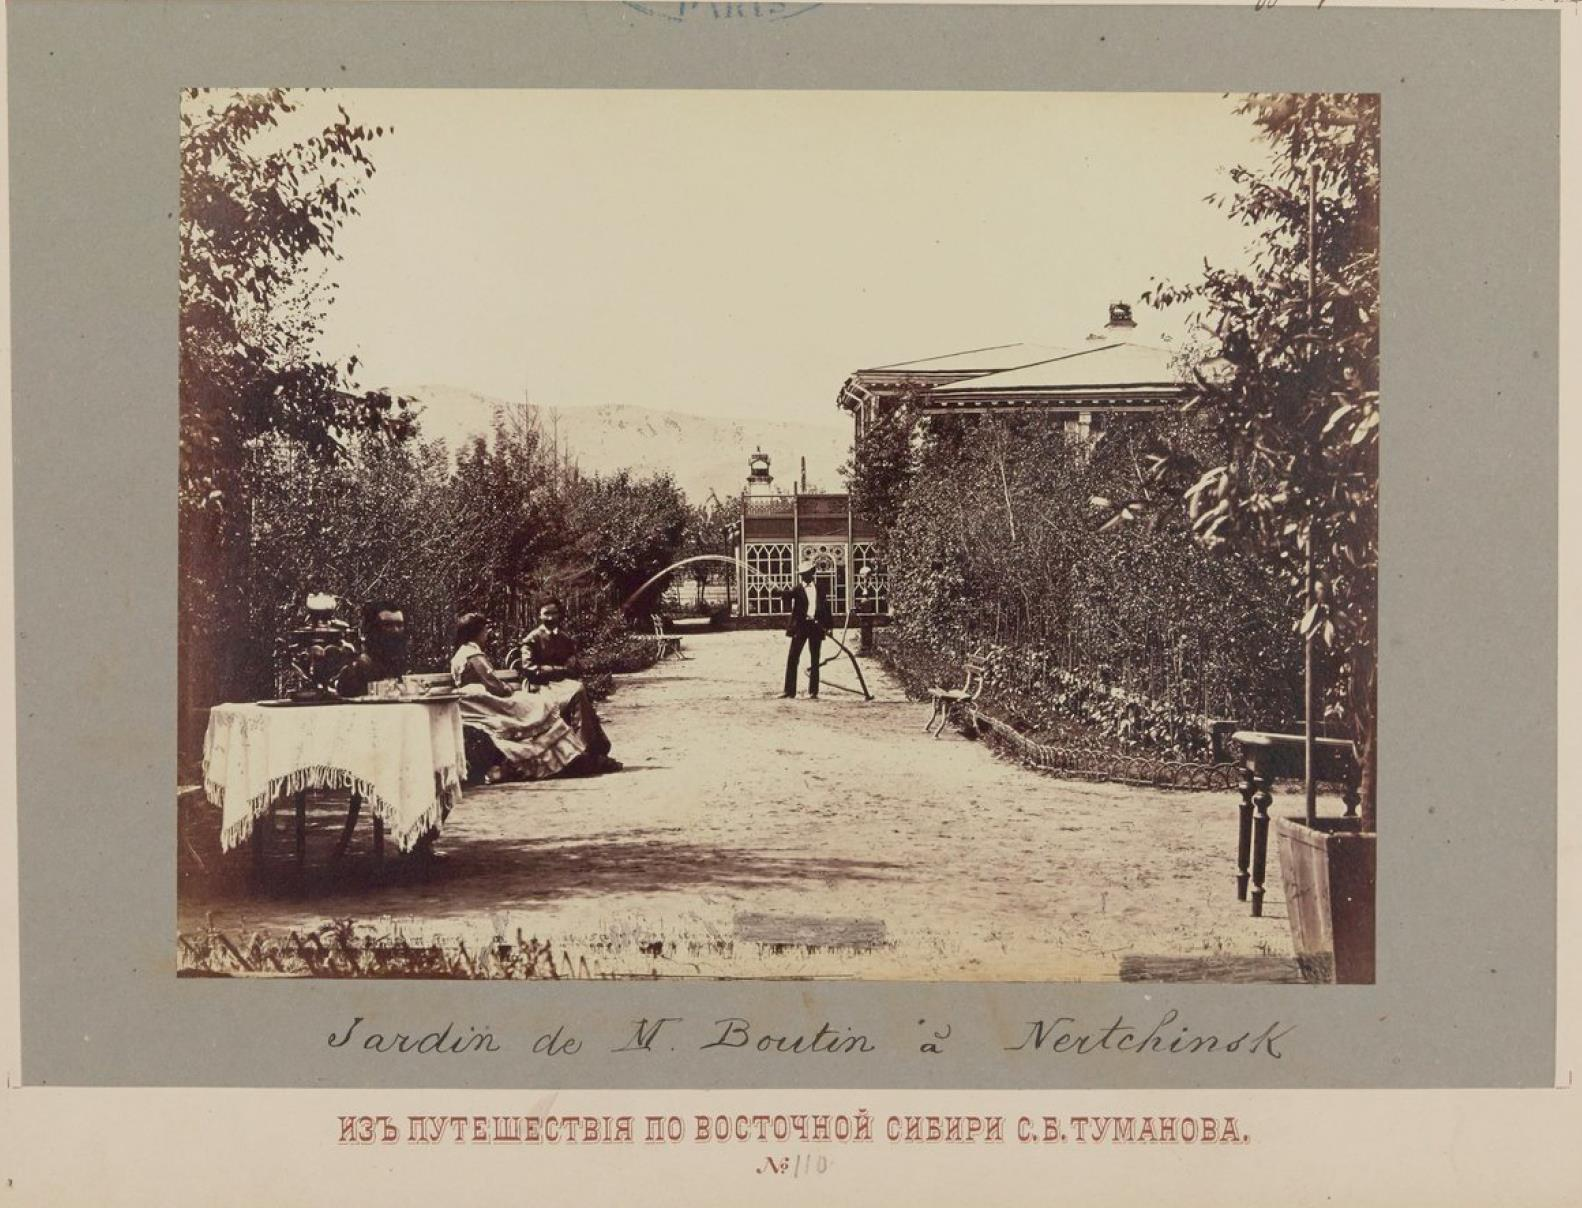 14. Сад М. Бутина в Нерчинске